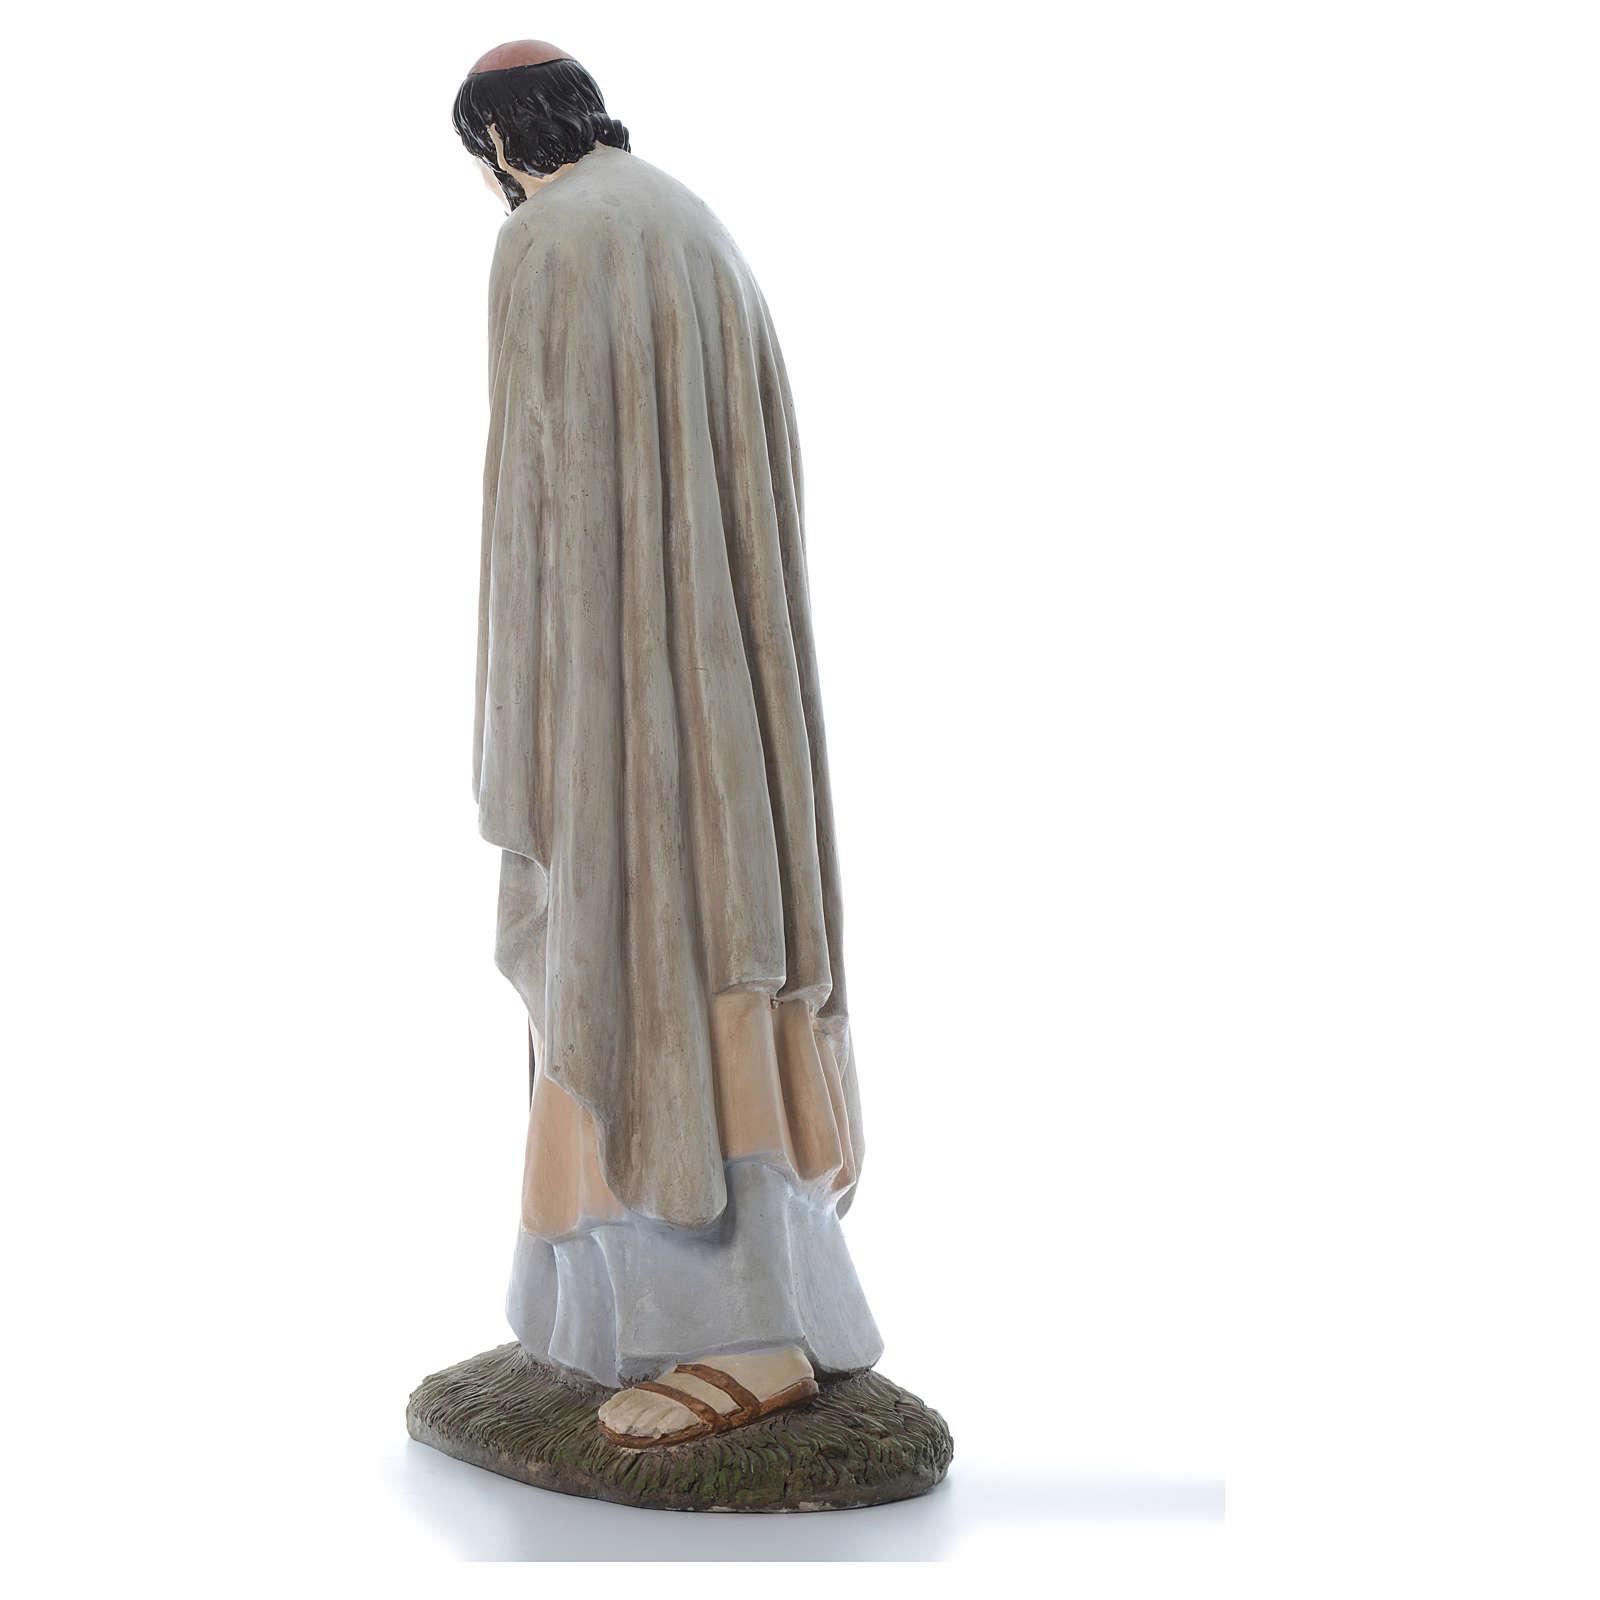 San josé 120 cm resina Linea Martino Landi 3